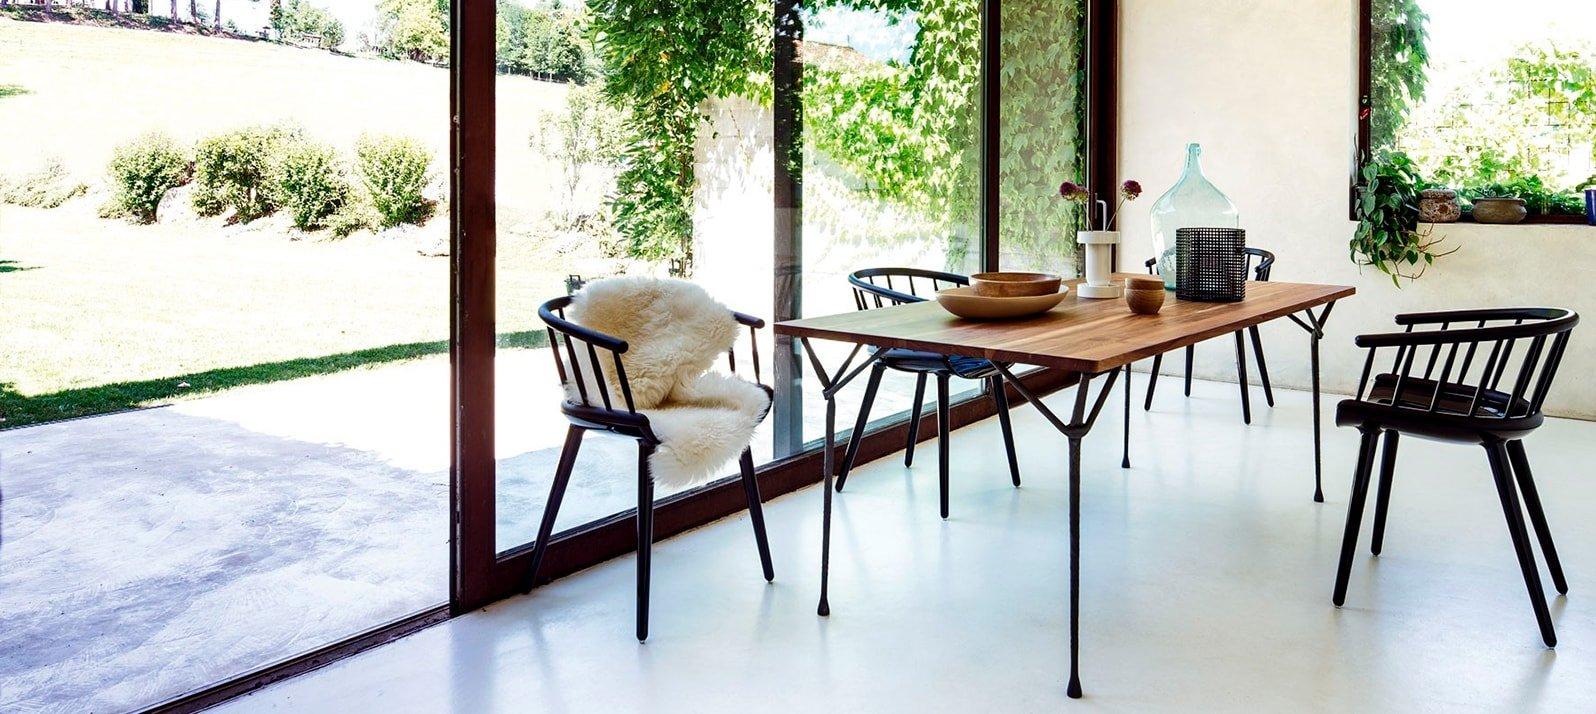 Designer Furniture Home Decor and Modern Lighting